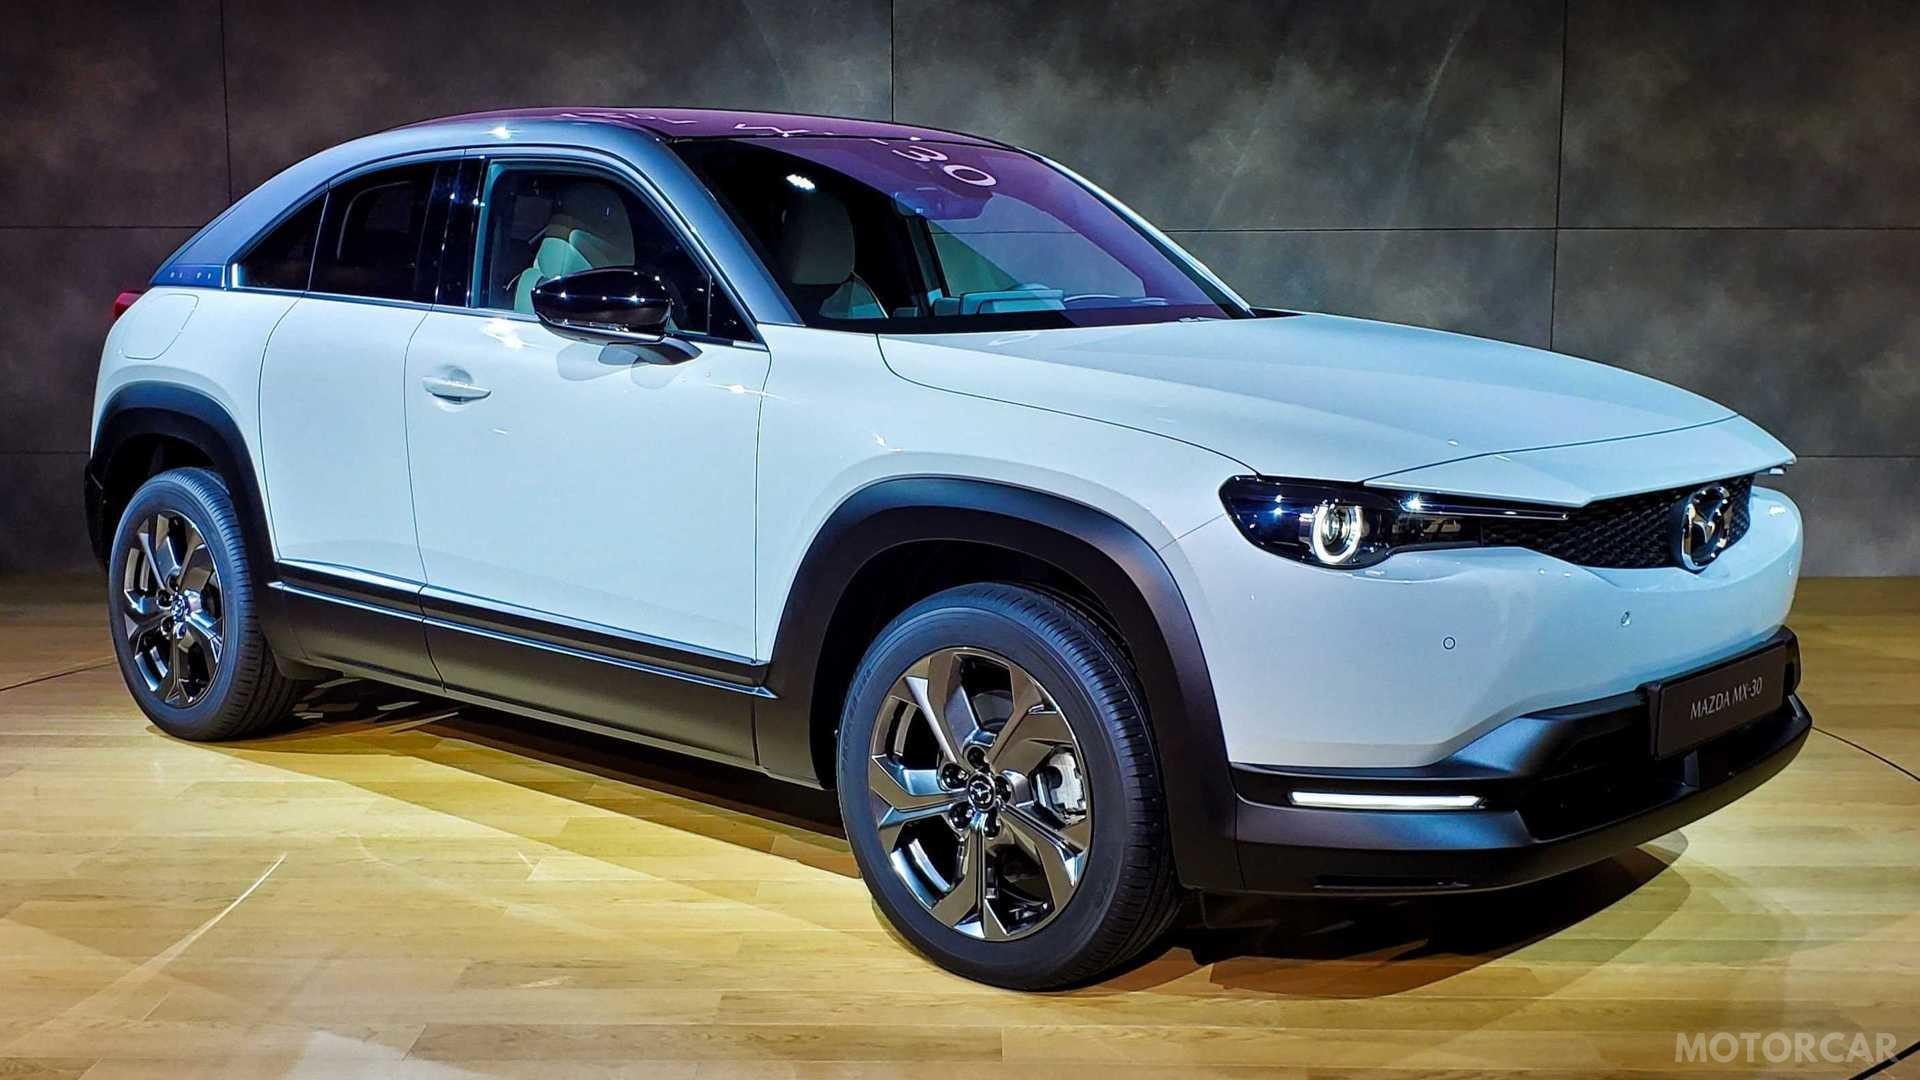 Галерея: Елегантний електрокросовер Mazda МХ-30